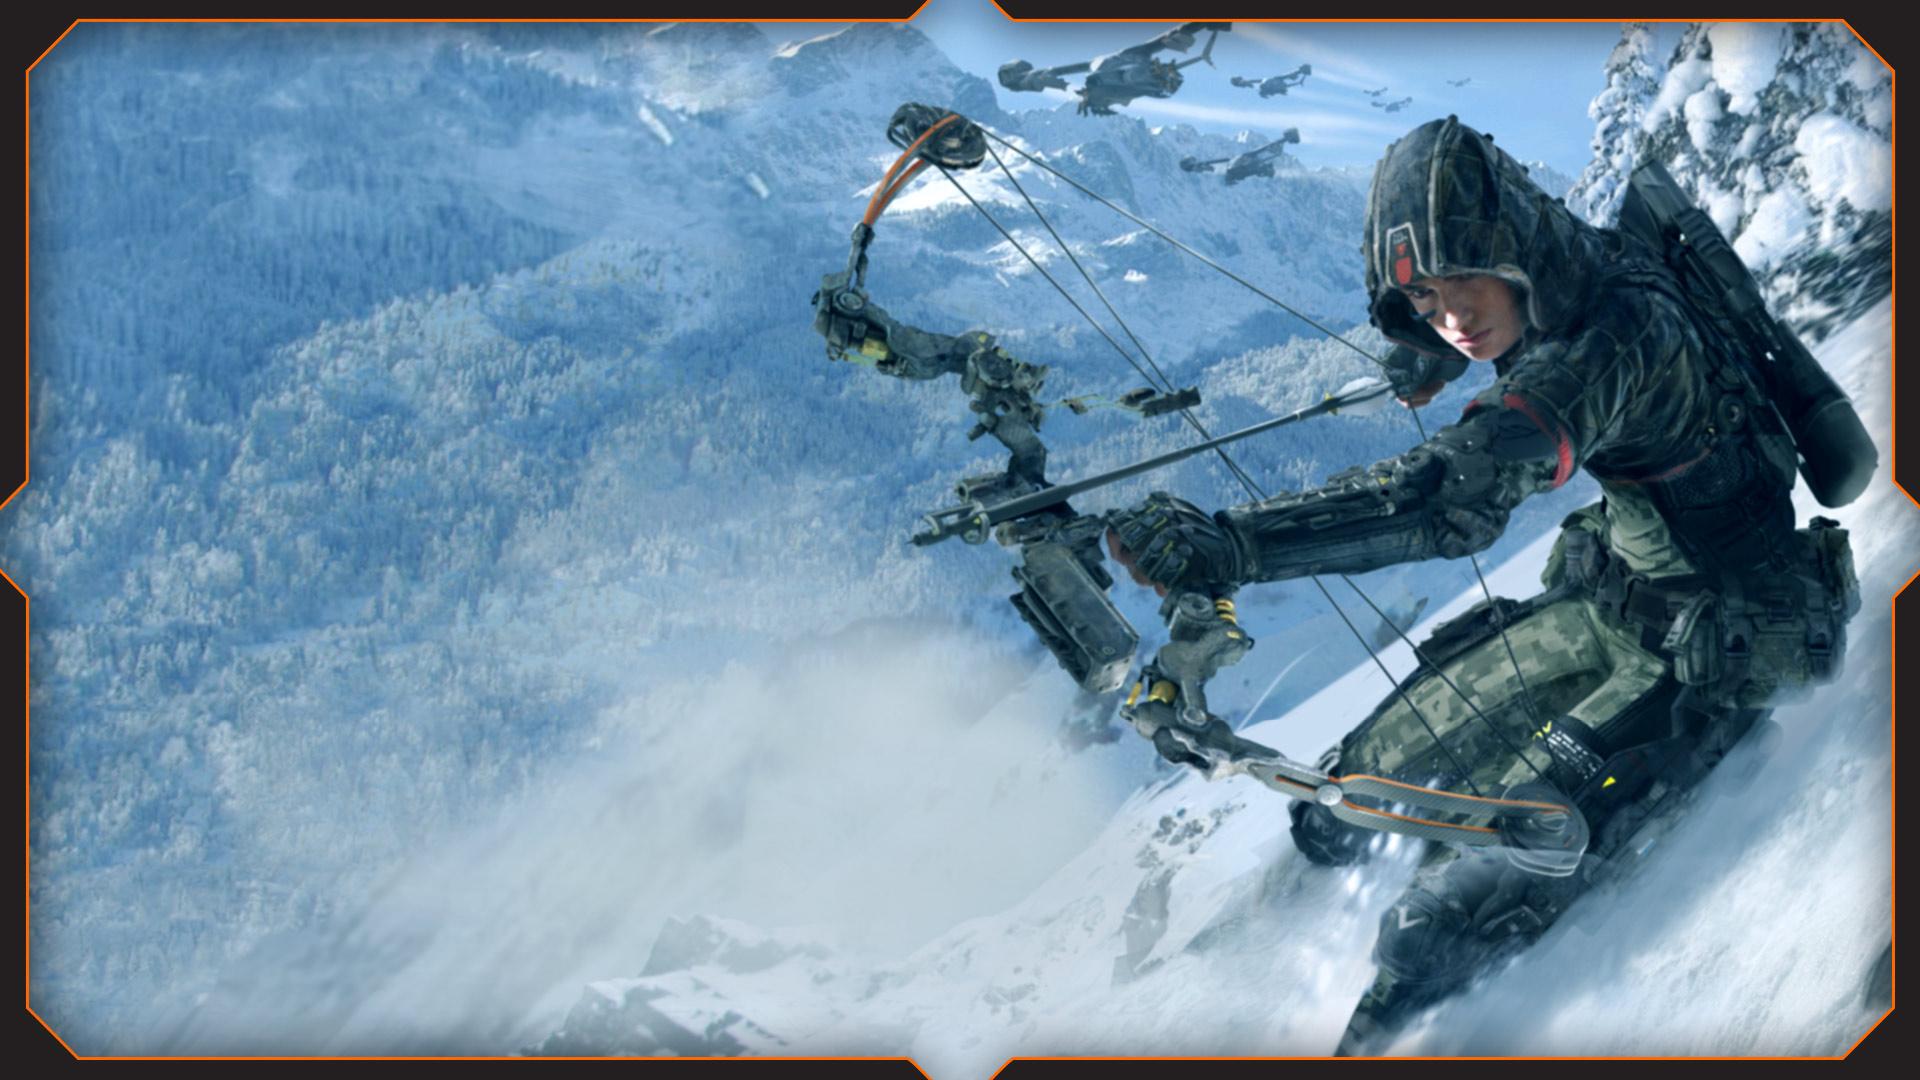 Steam Card Exchange Showcase Call of Duty Black Ops III